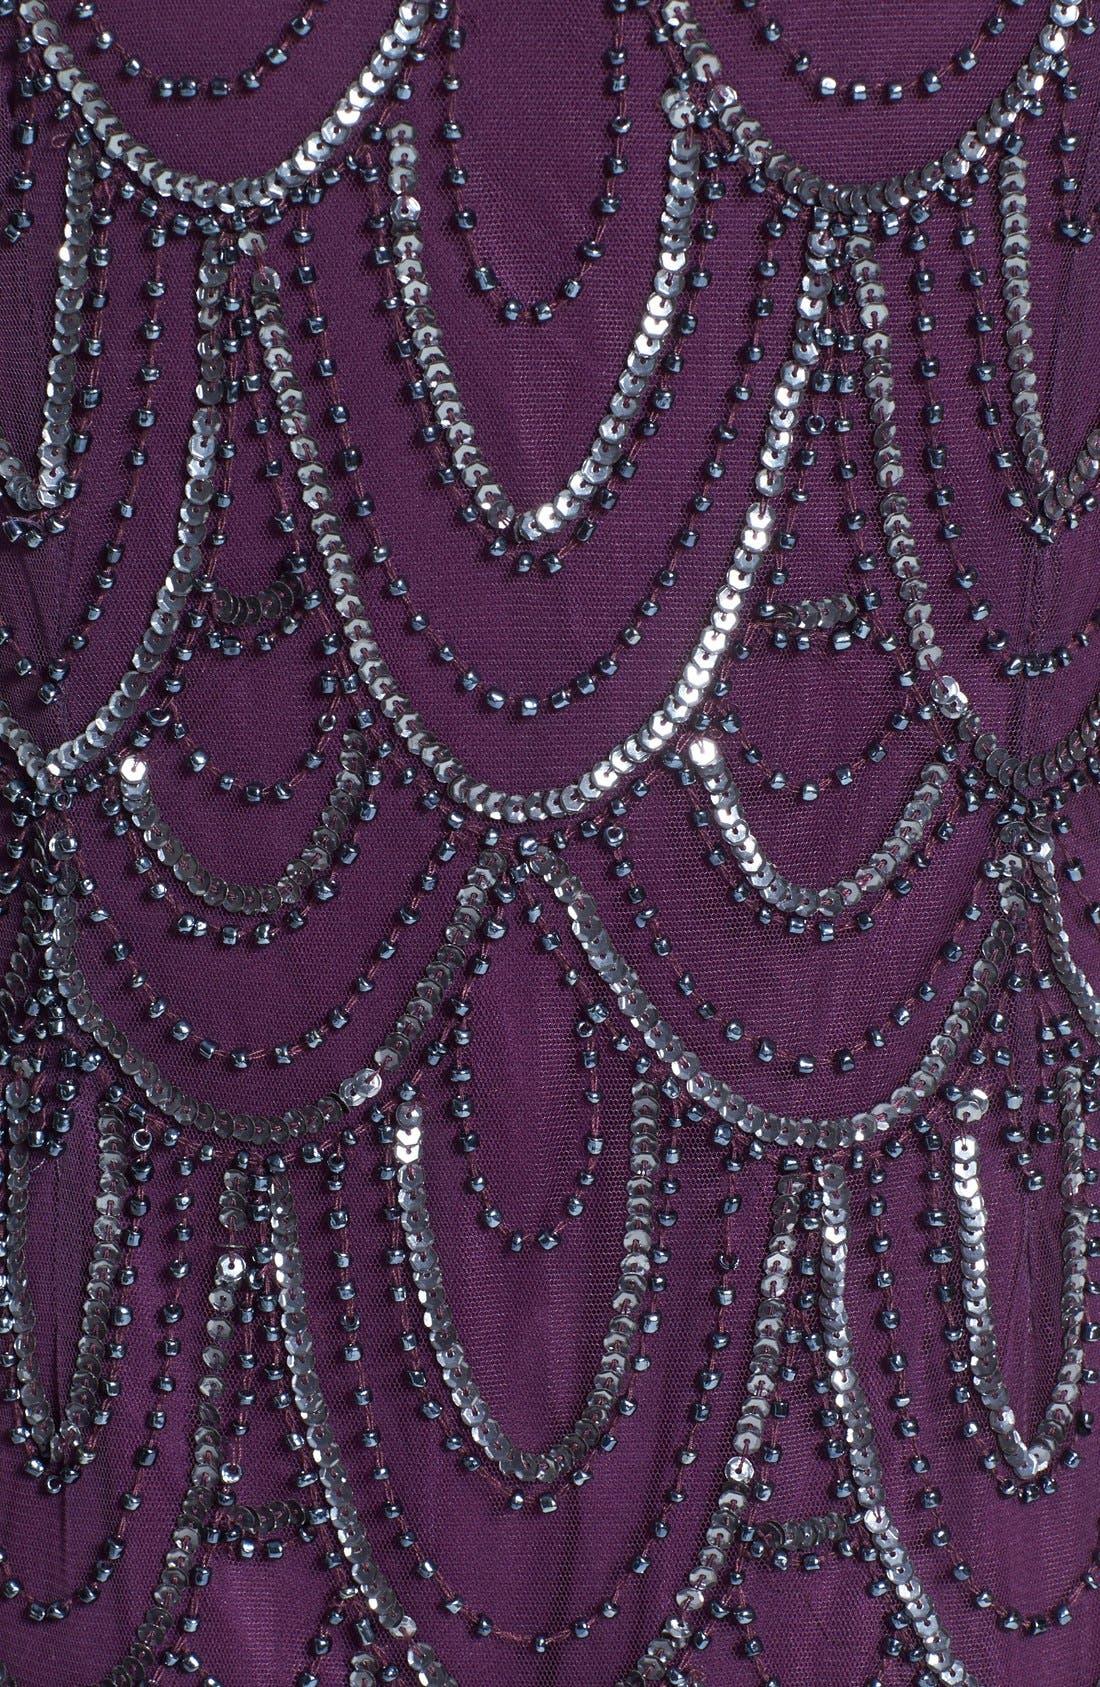 Embellished Mesh Sheath Dress,                             Alternate thumbnail 107, color,